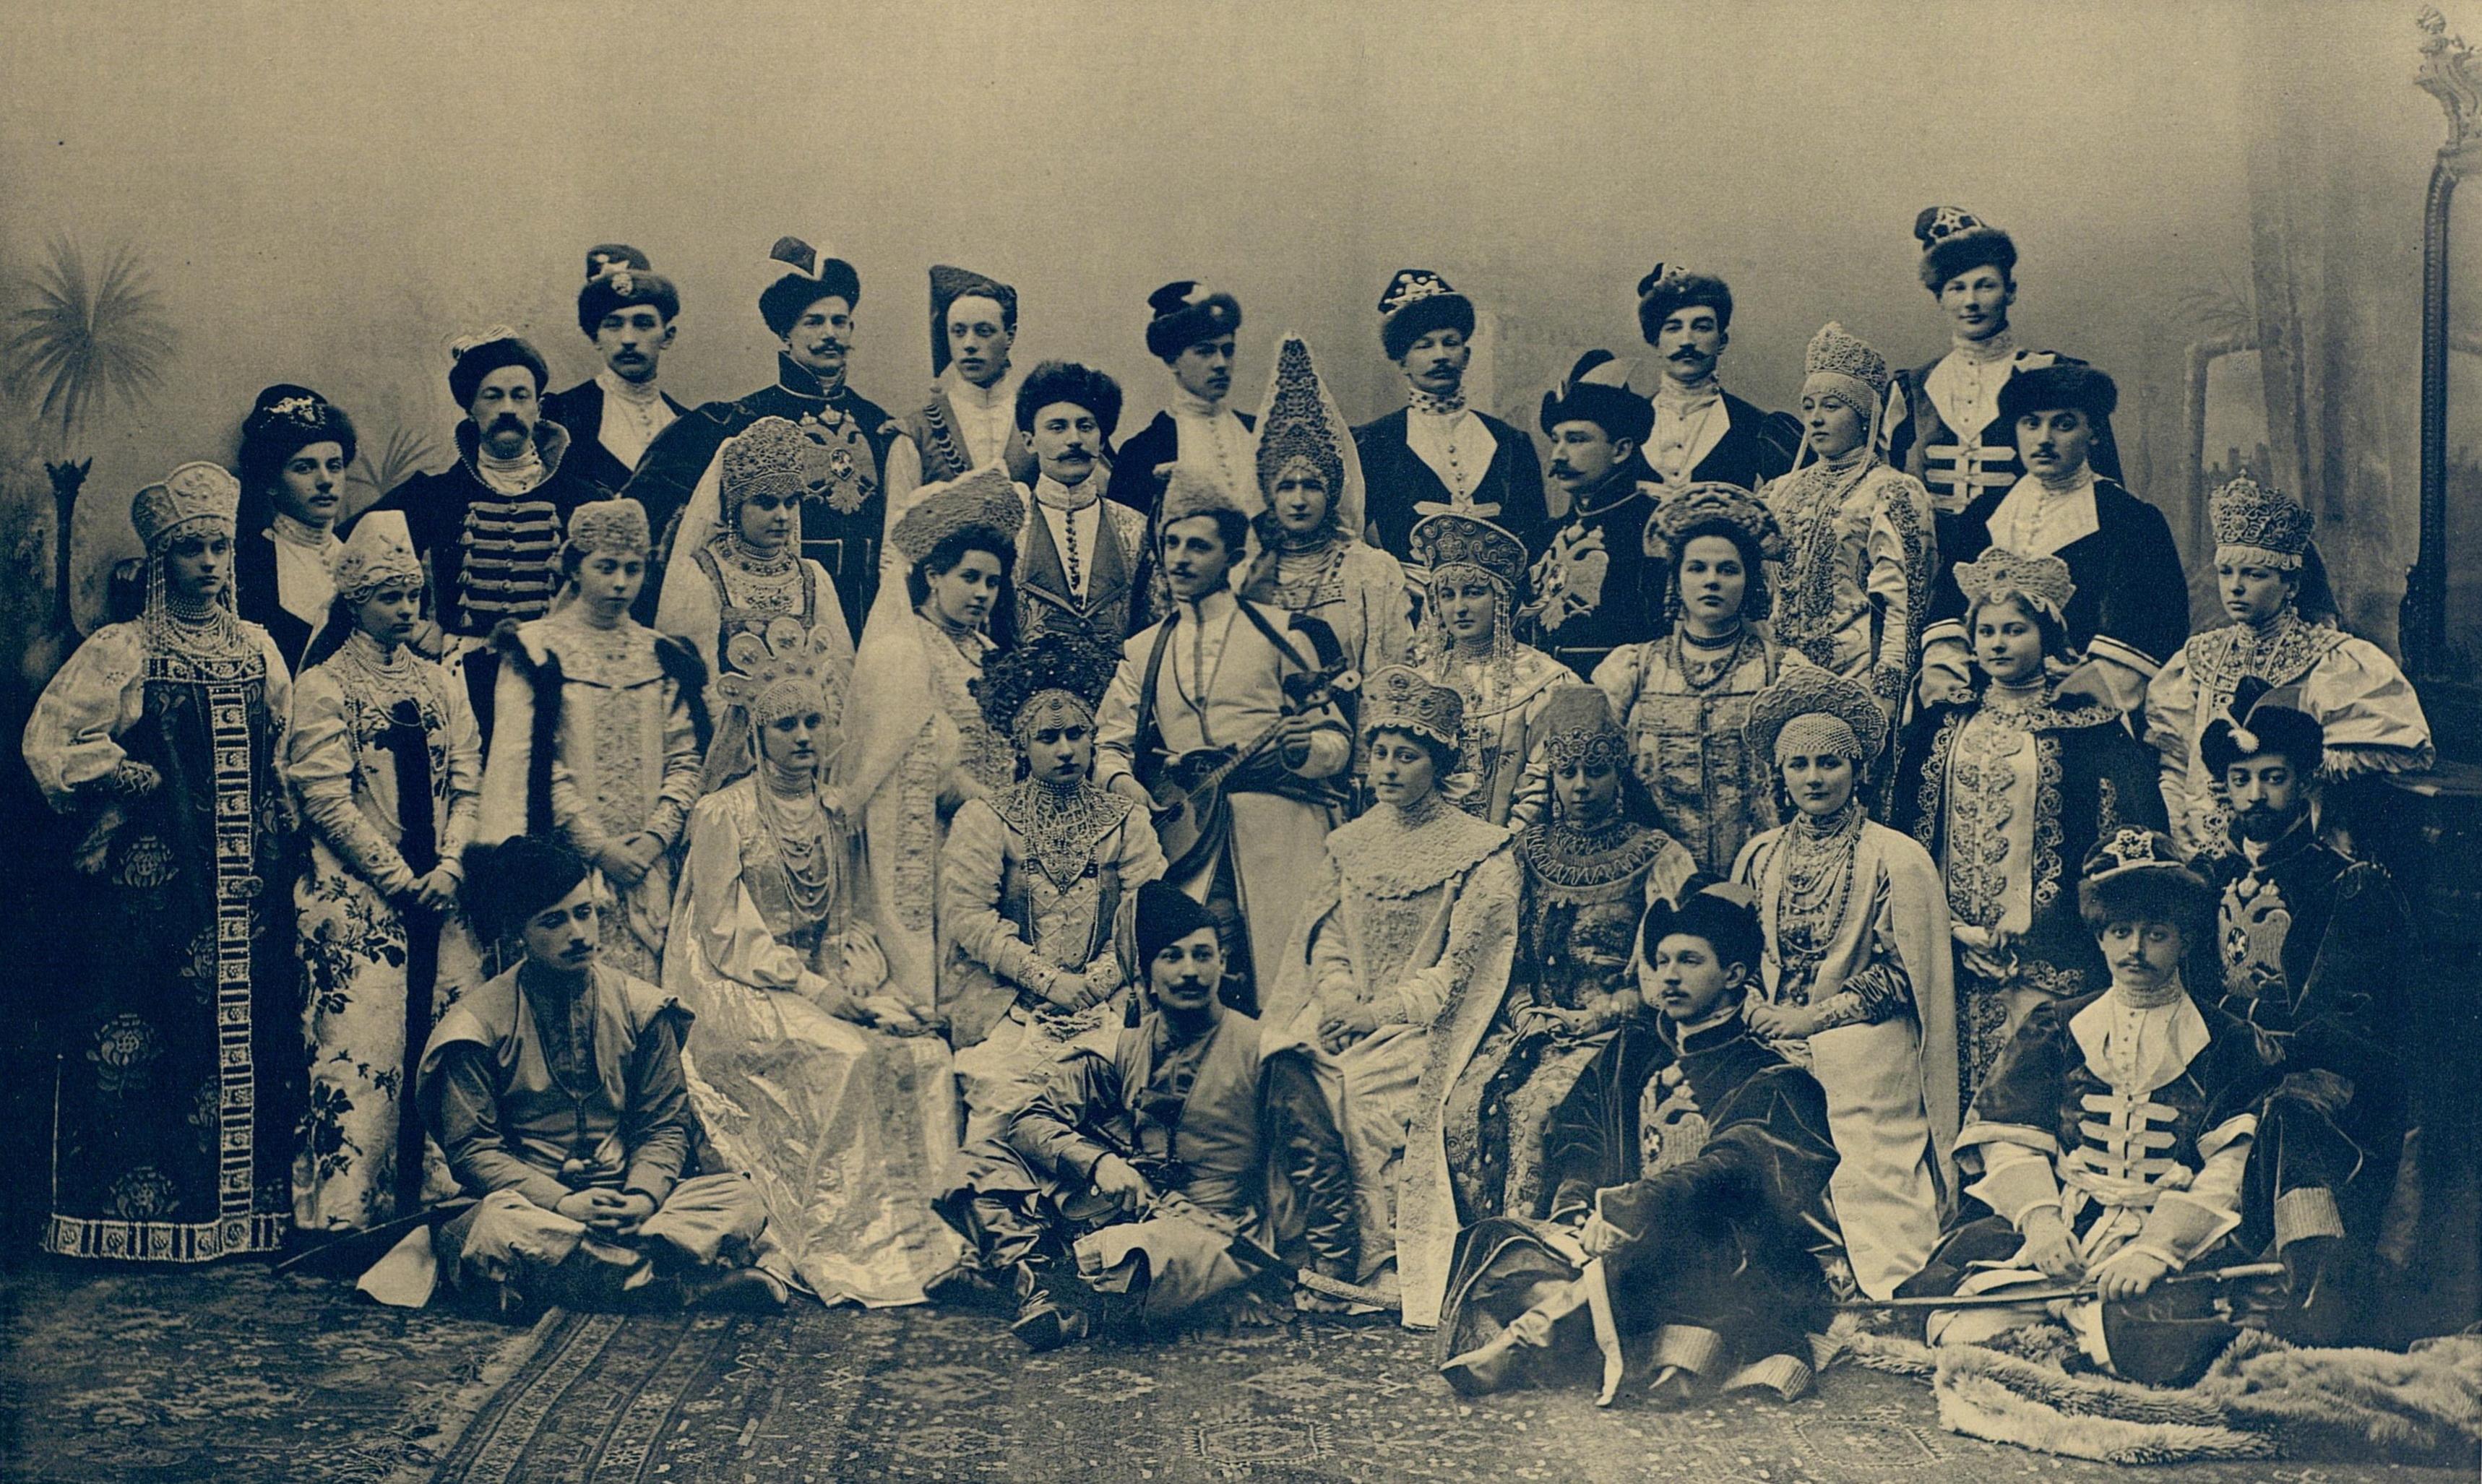 File:1903 ball - 01 group.jpg - Wikimedia Commons